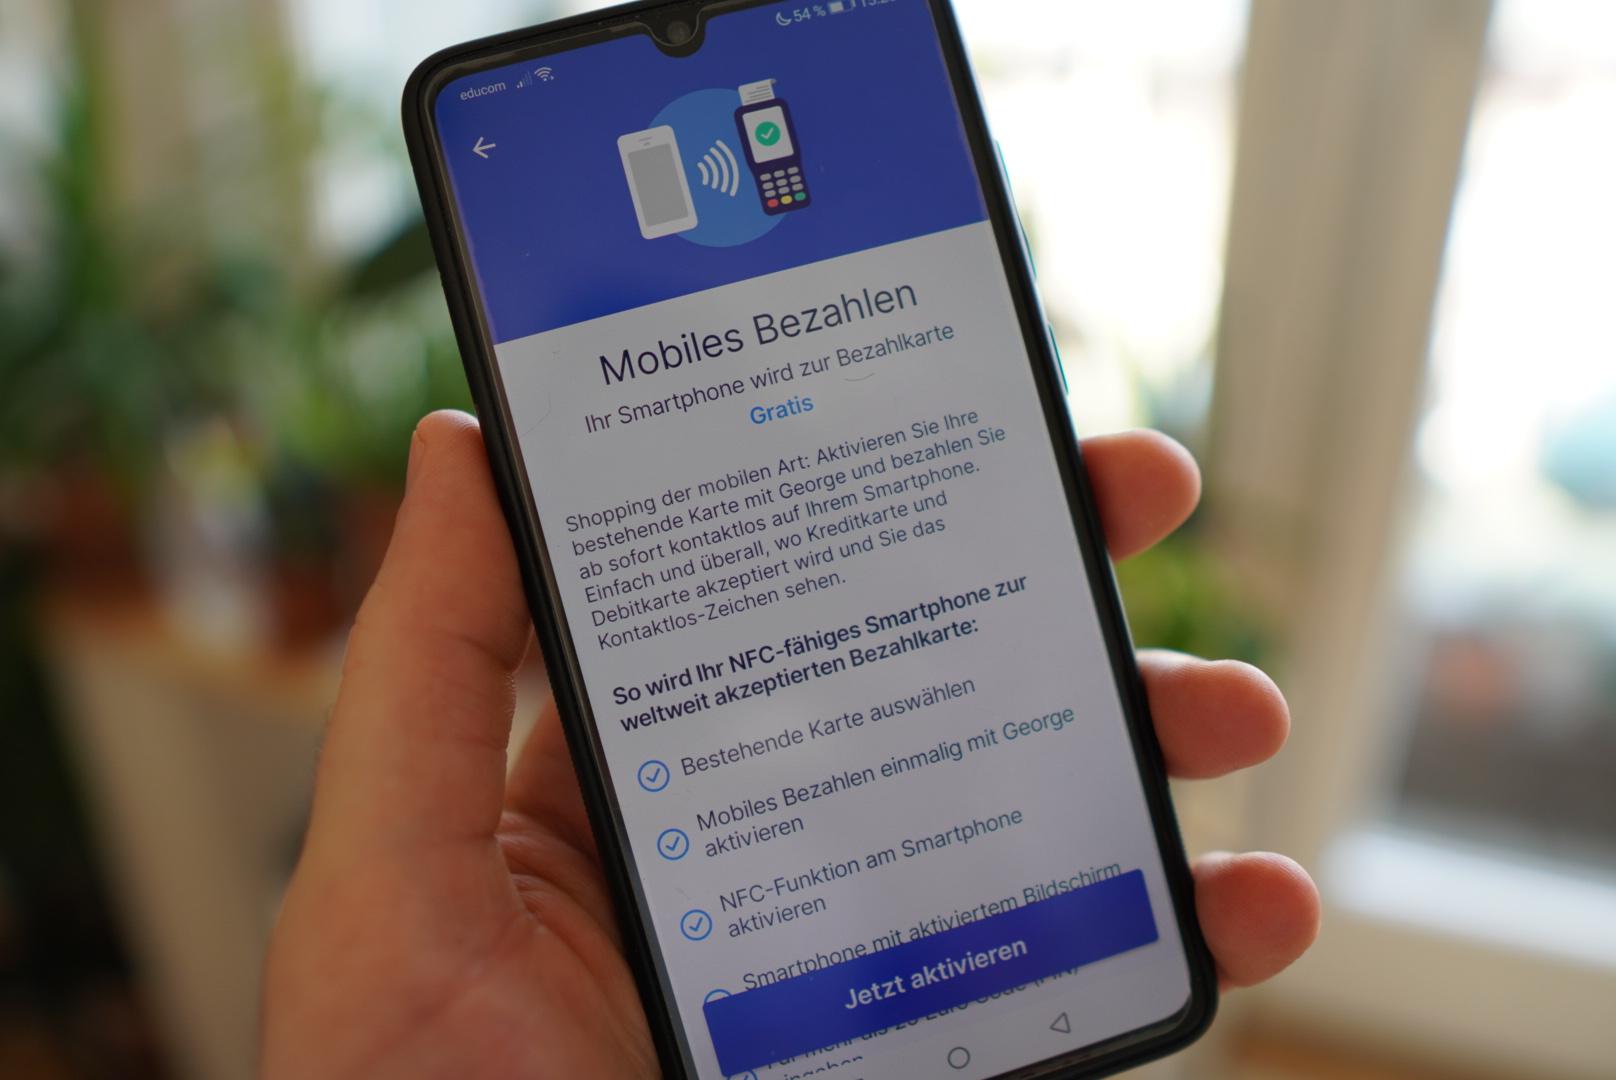 Smartphone mit mobilem Bezahlen